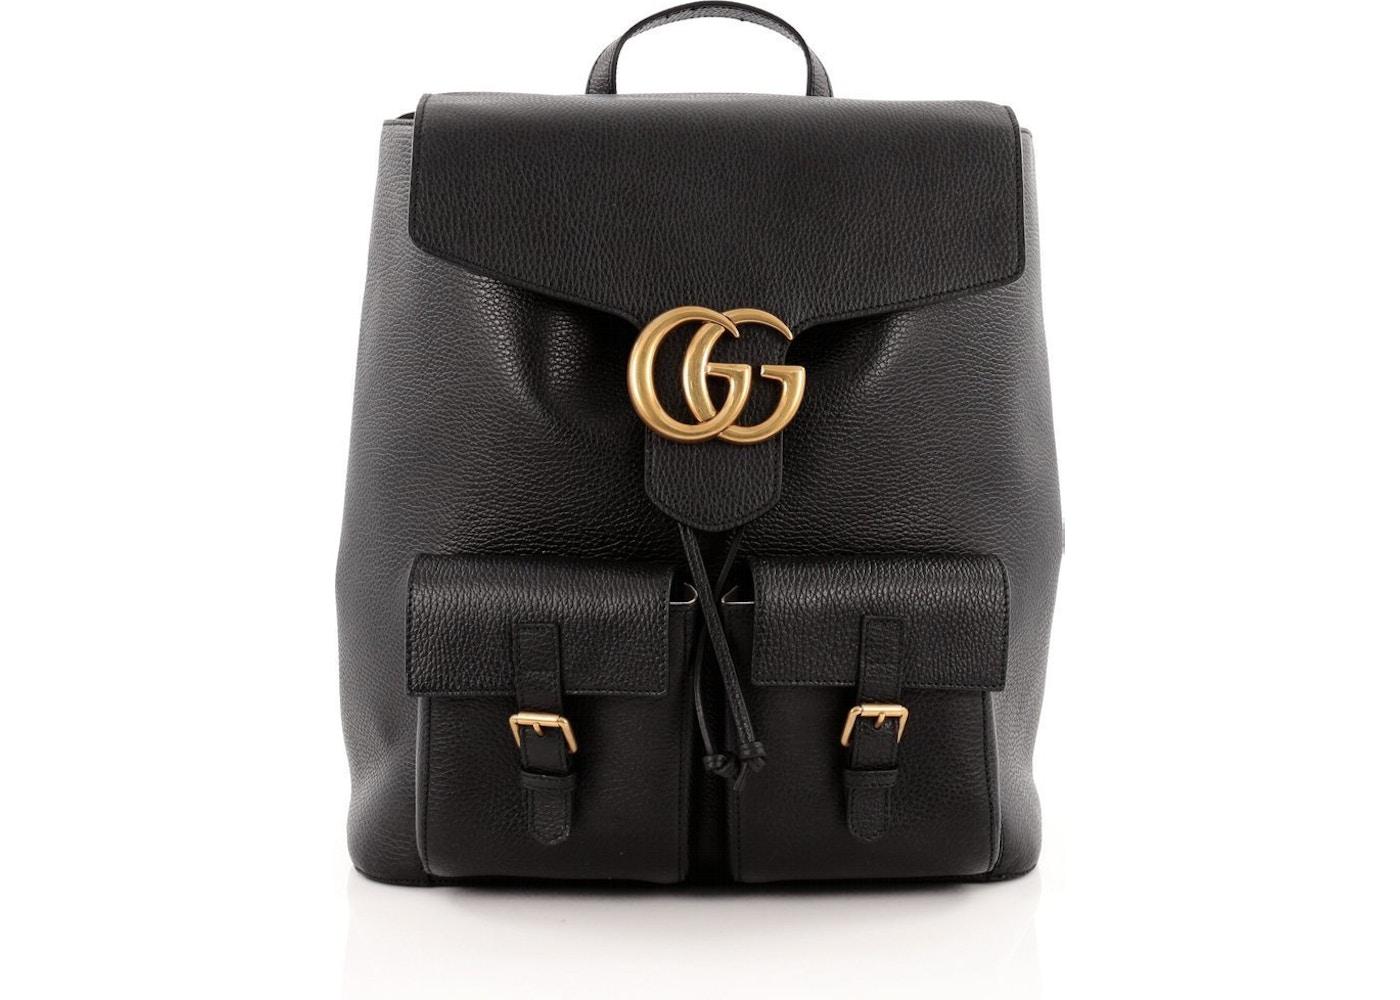 a6a639a1436 Black Leather Backpack Handbags Sale- Fenix Toulouse Handball